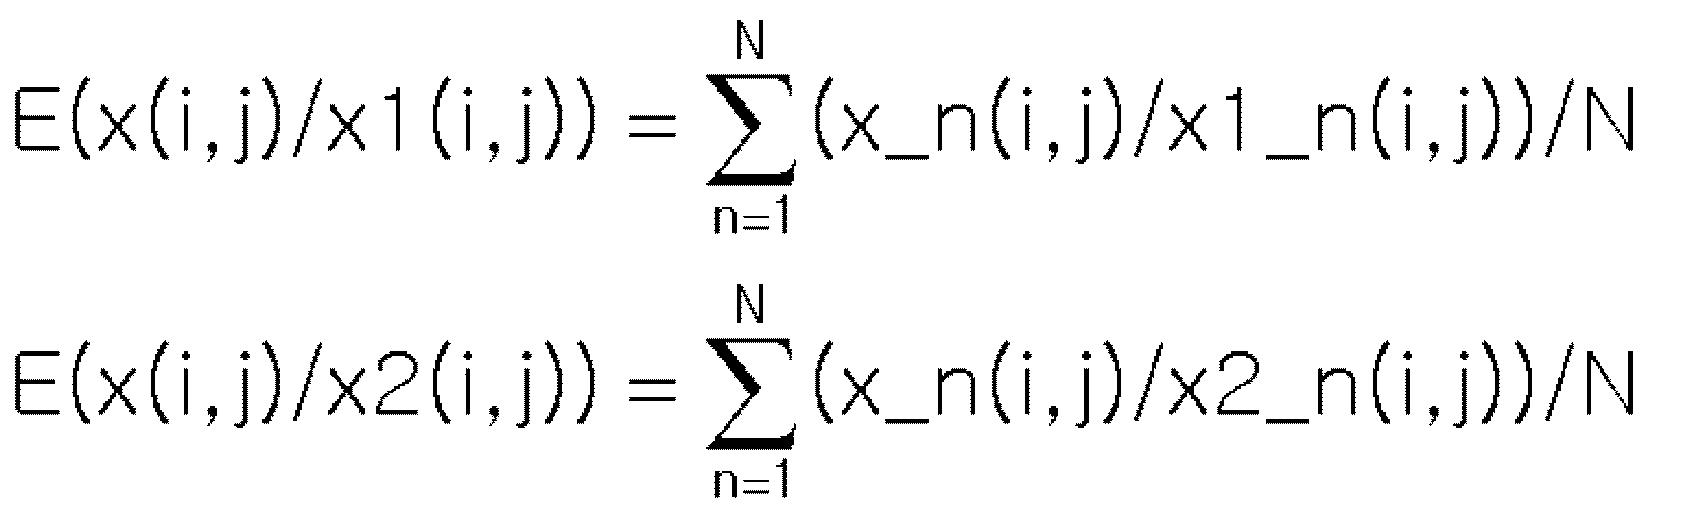 Figure PCTKR2015011873-appb-I000001